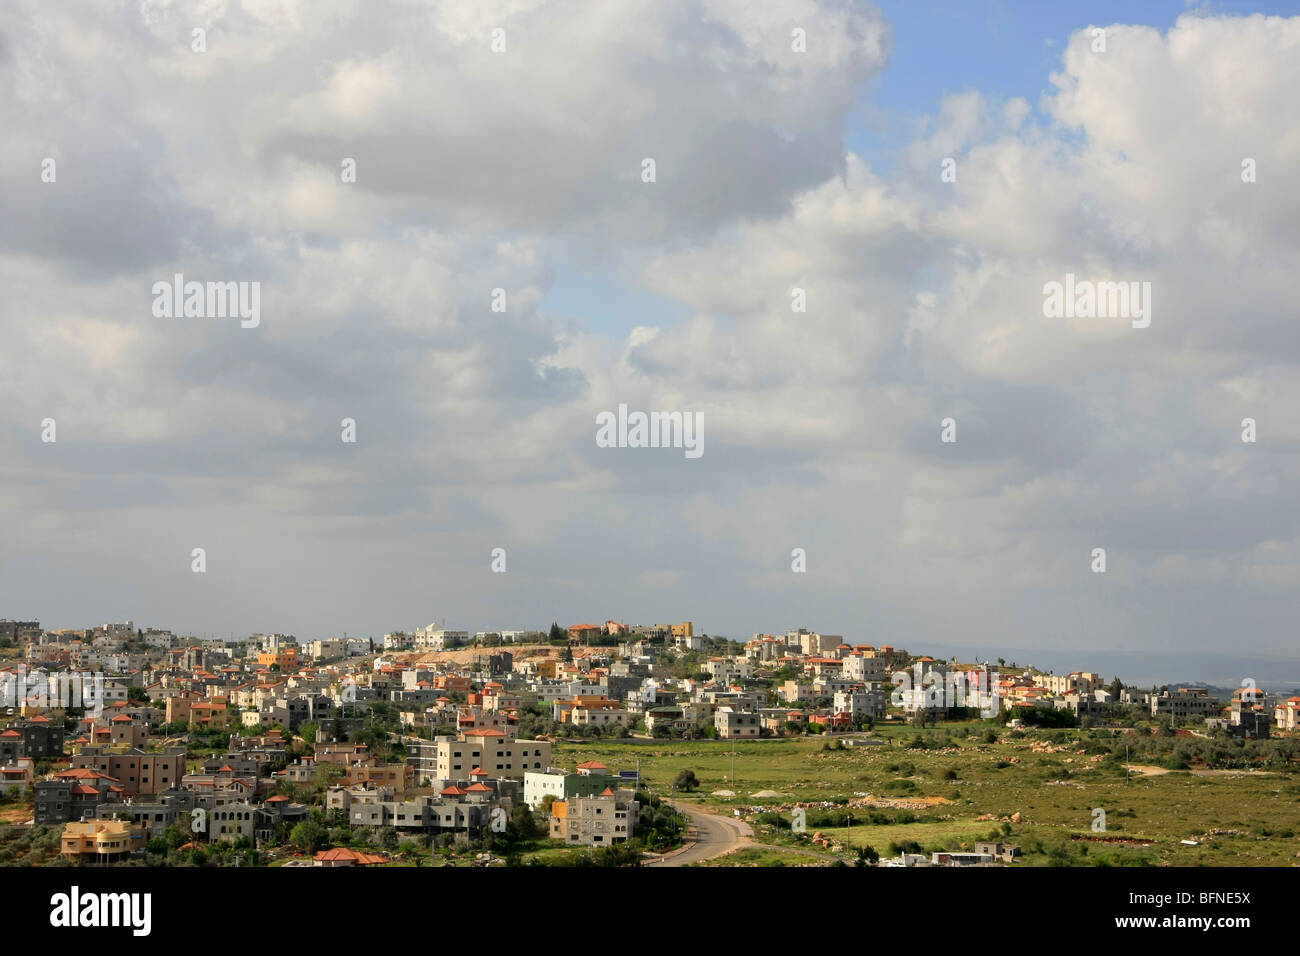 Israel, la Baja Galilea, aldea árabe Kaukab Abu el-hija Imagen De Stock